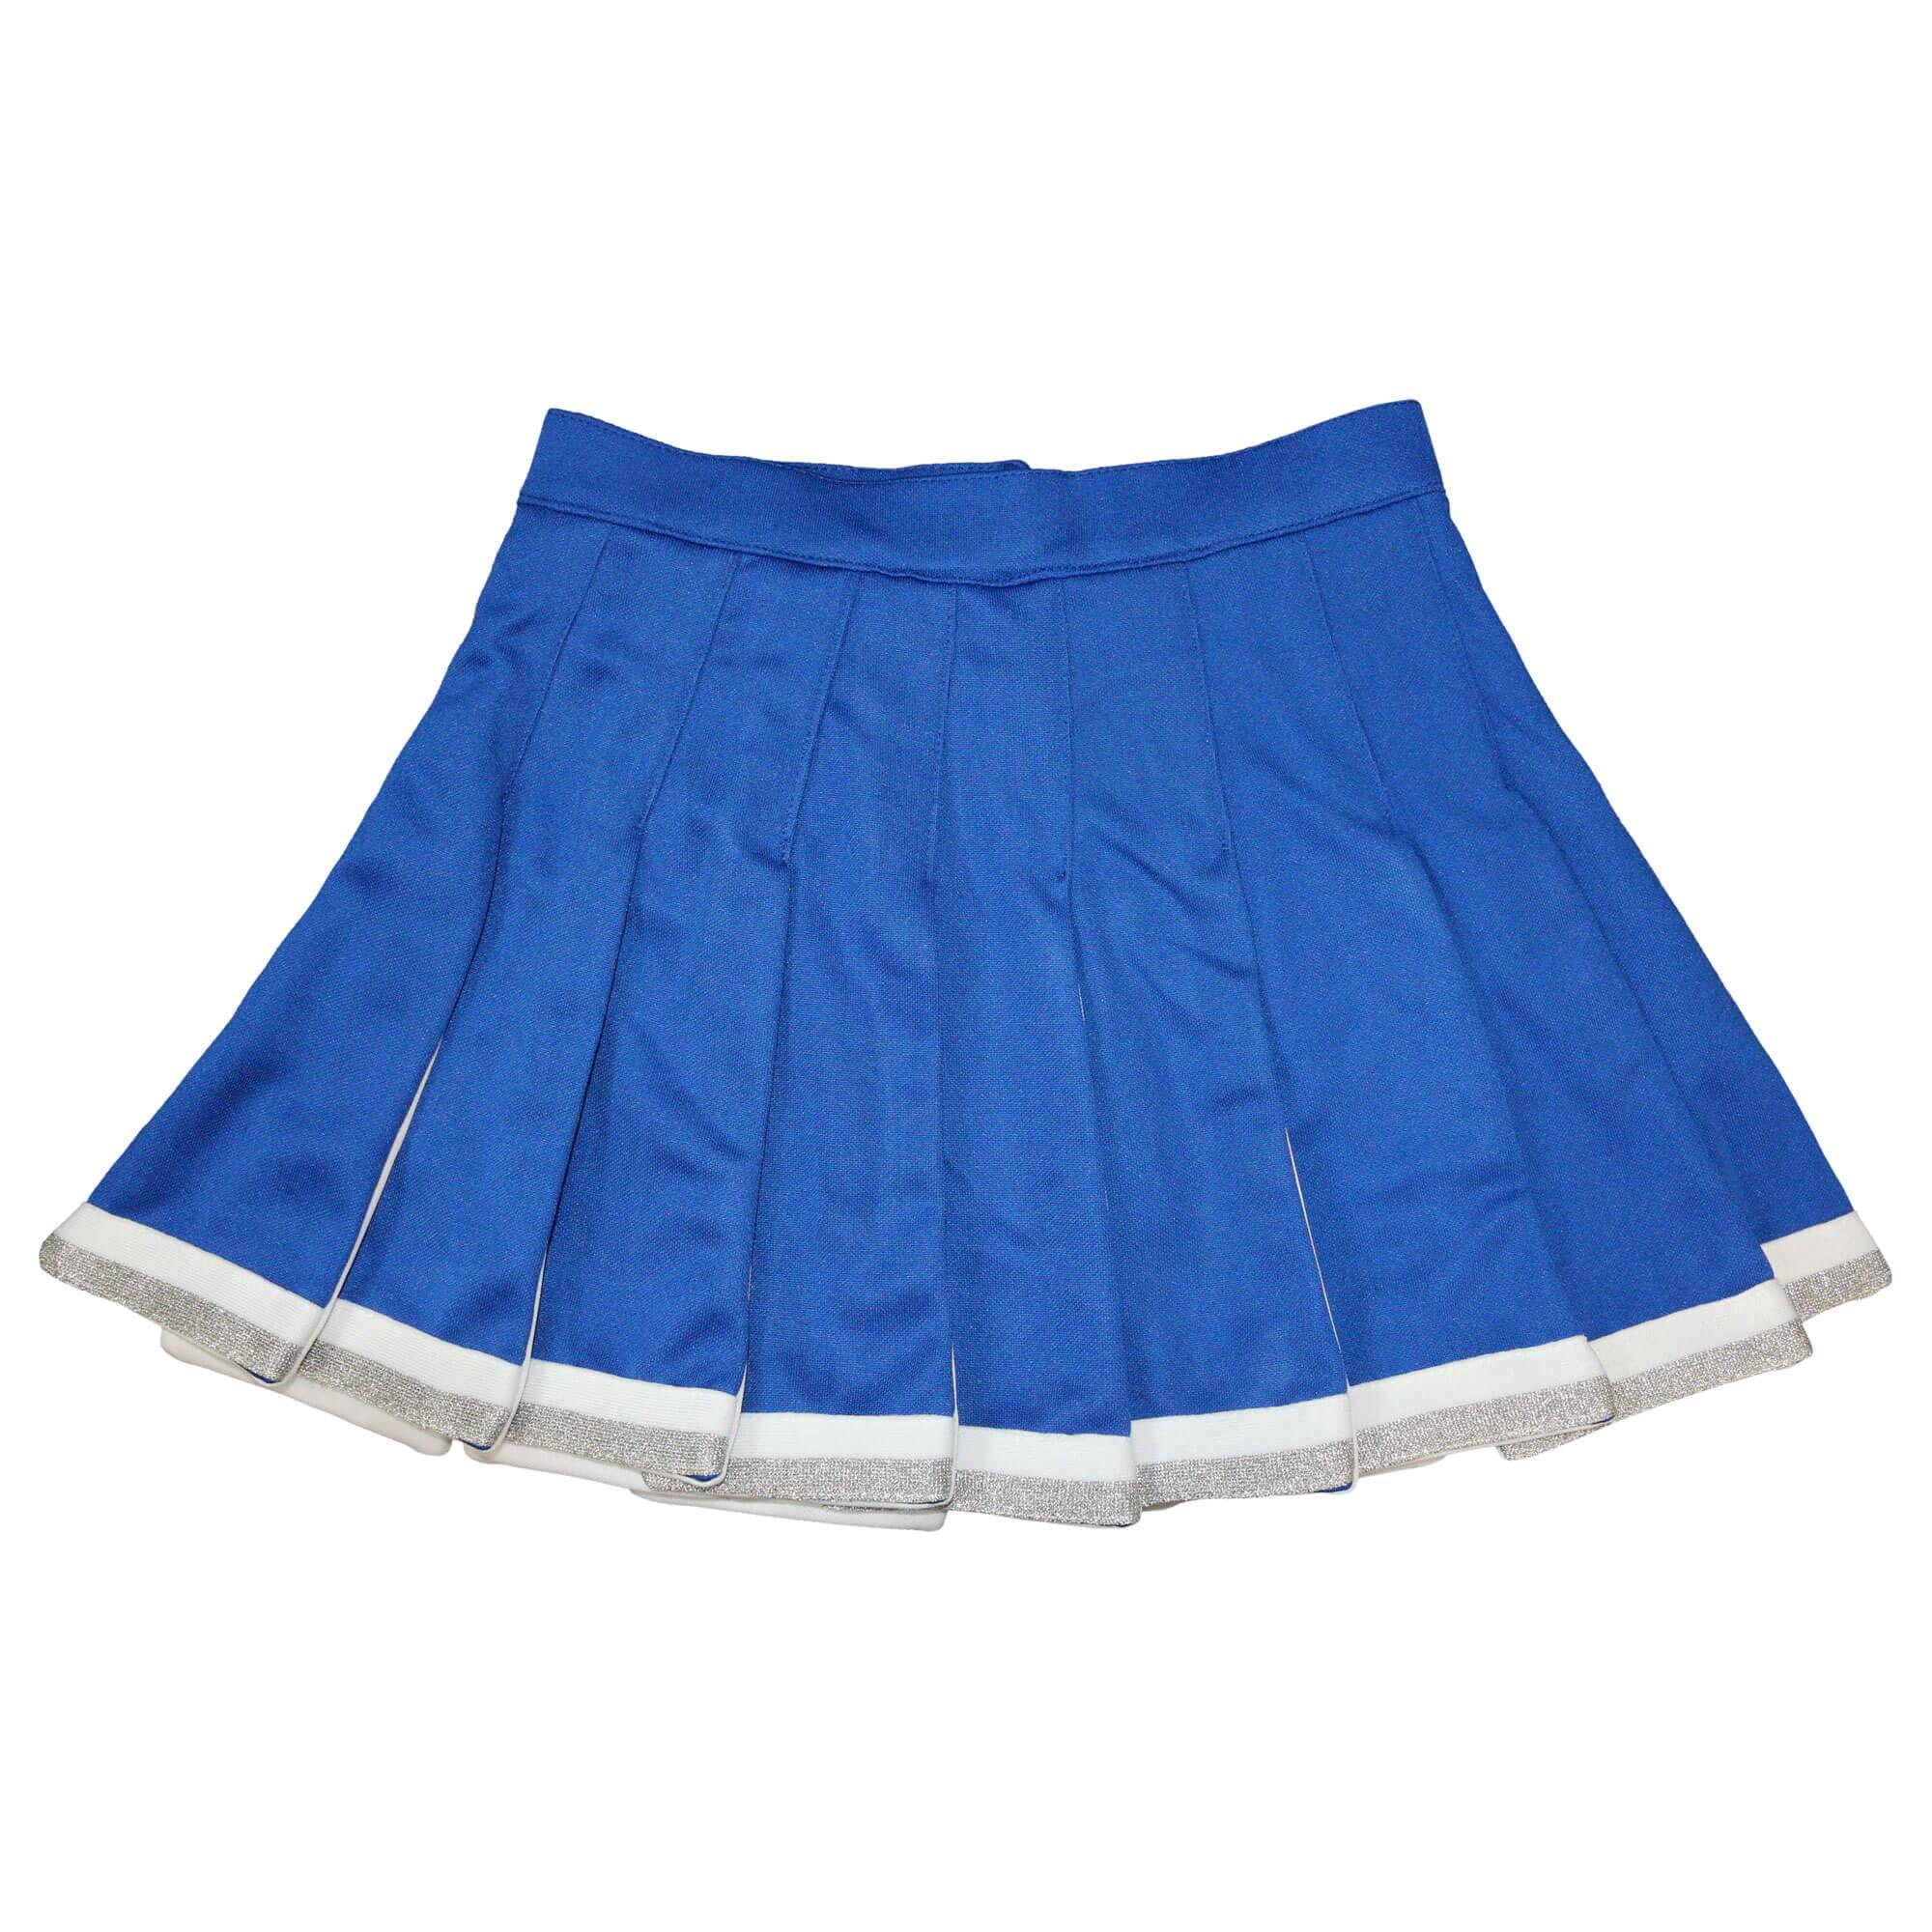 Danzcue Child Cheerleading Pleated Skirt, Royal/White, X-Small